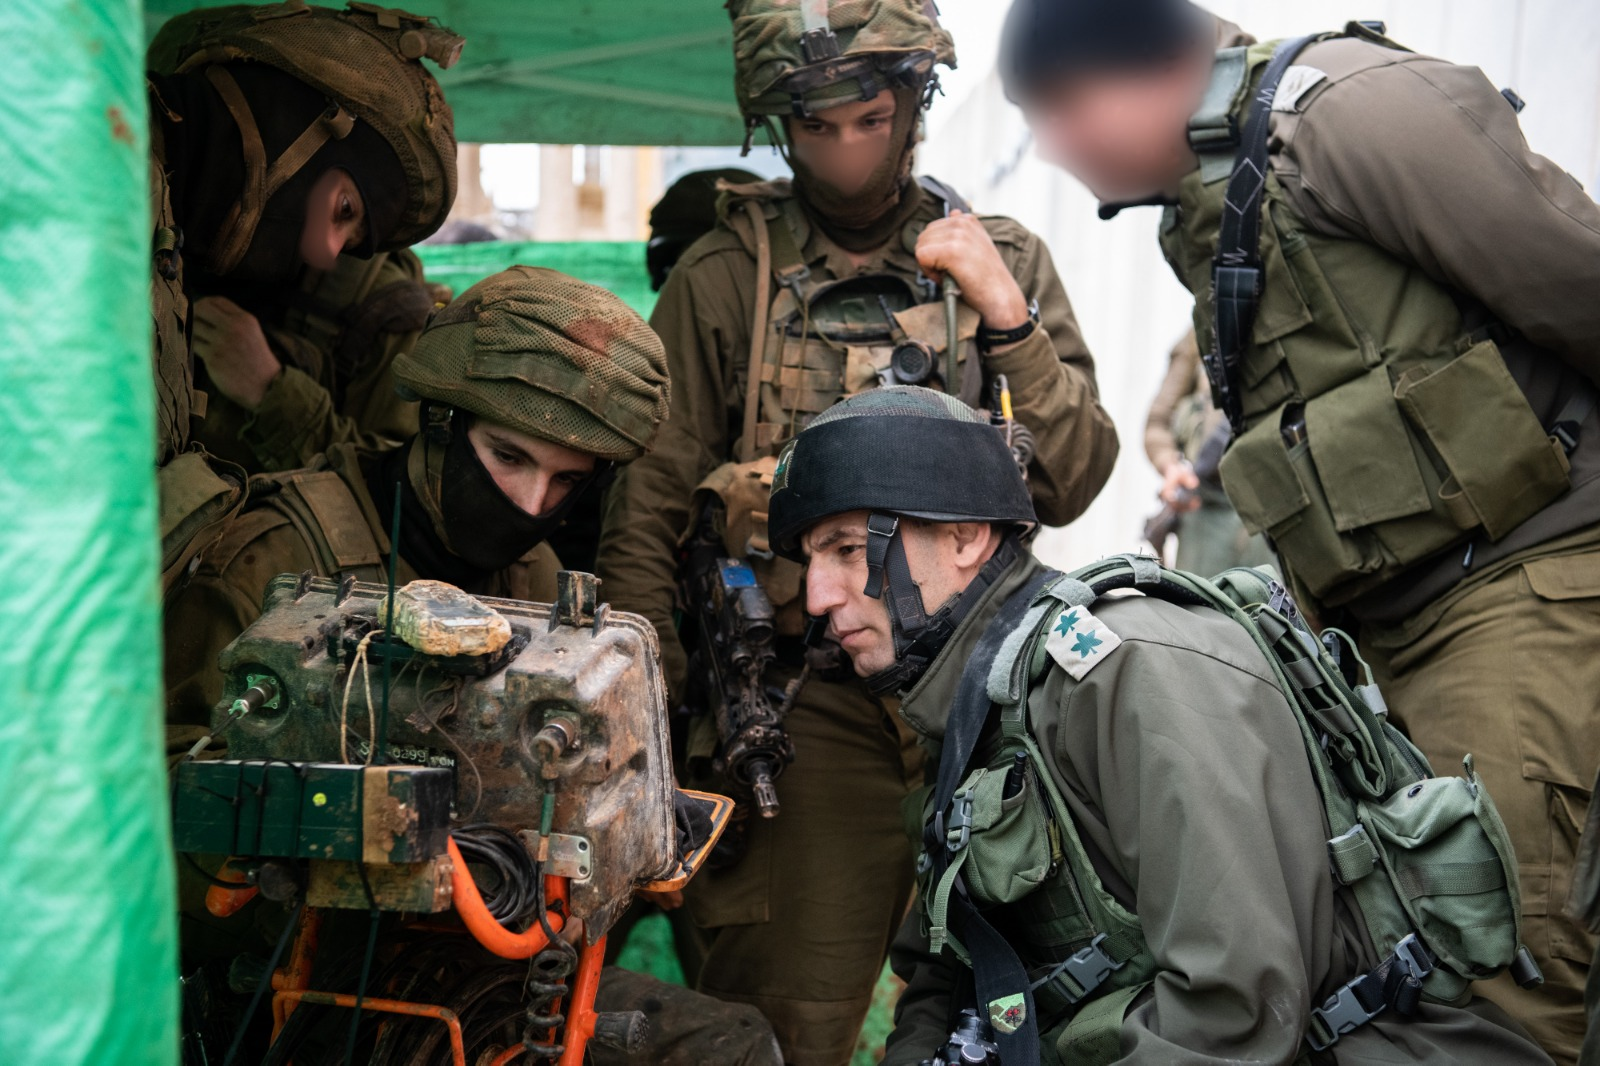 Israel descubre un tercer túnel transfronterizo de Hezbollah